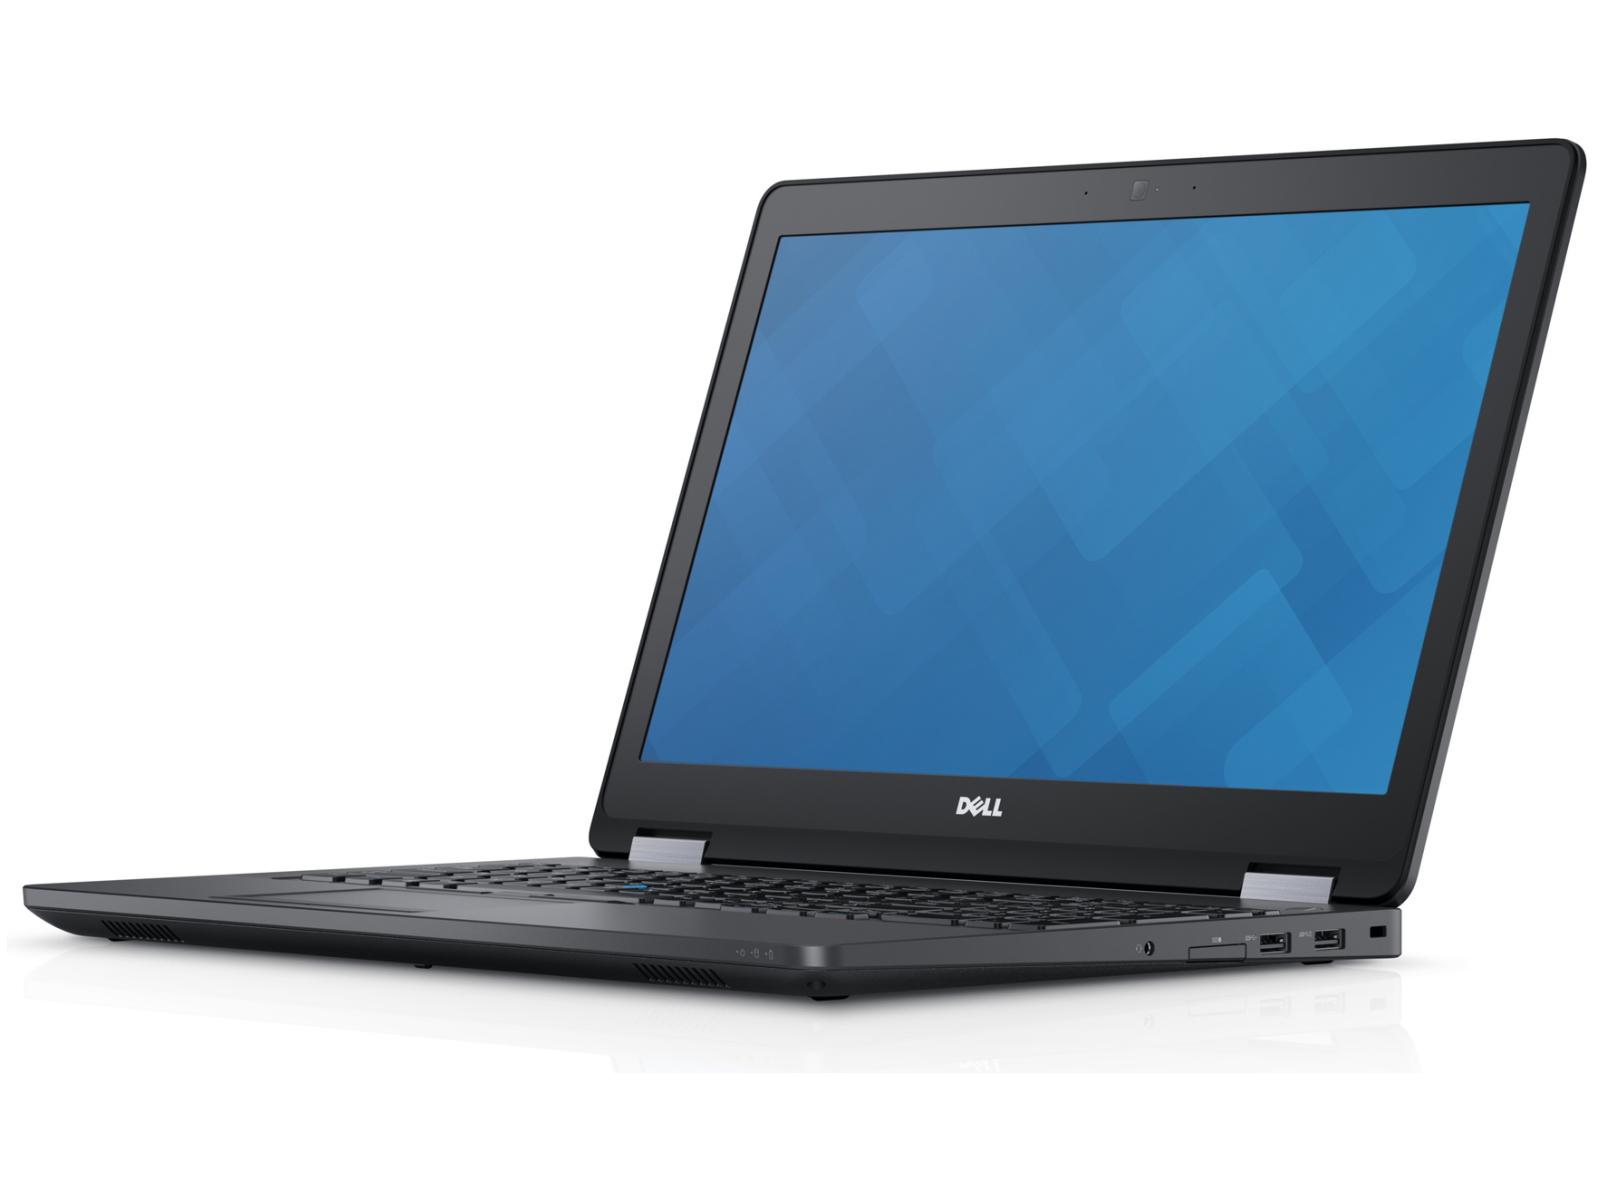 Dell Latitude 15 E5570 Notebook Review Notebookcheck Net Reviews